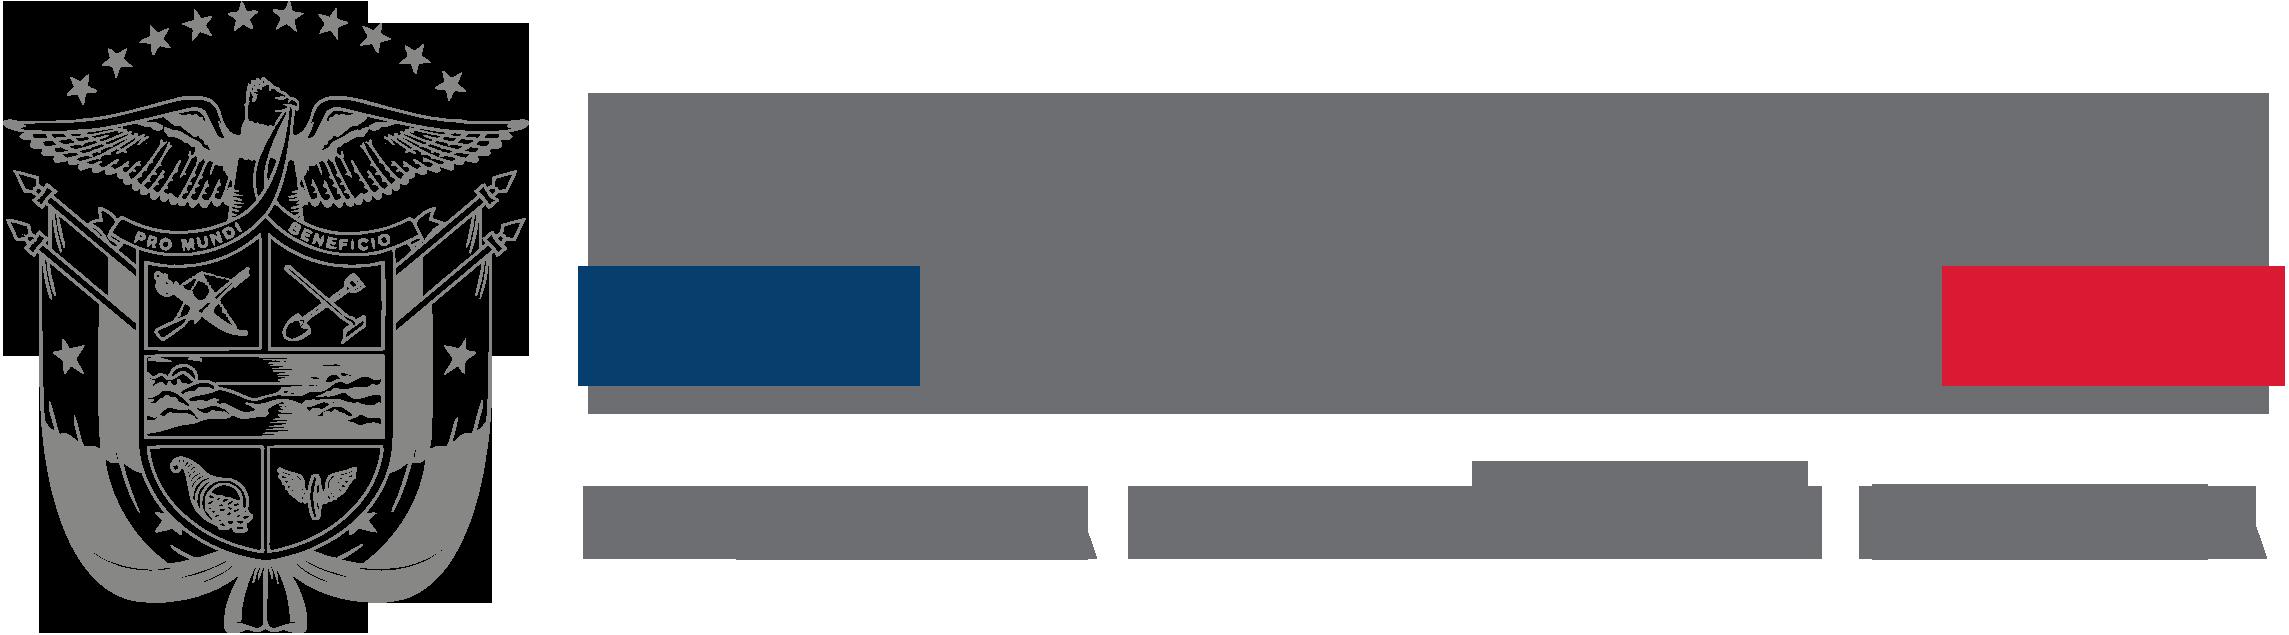 Ambassade du Panama en France - Embajada de Panamá en Francia